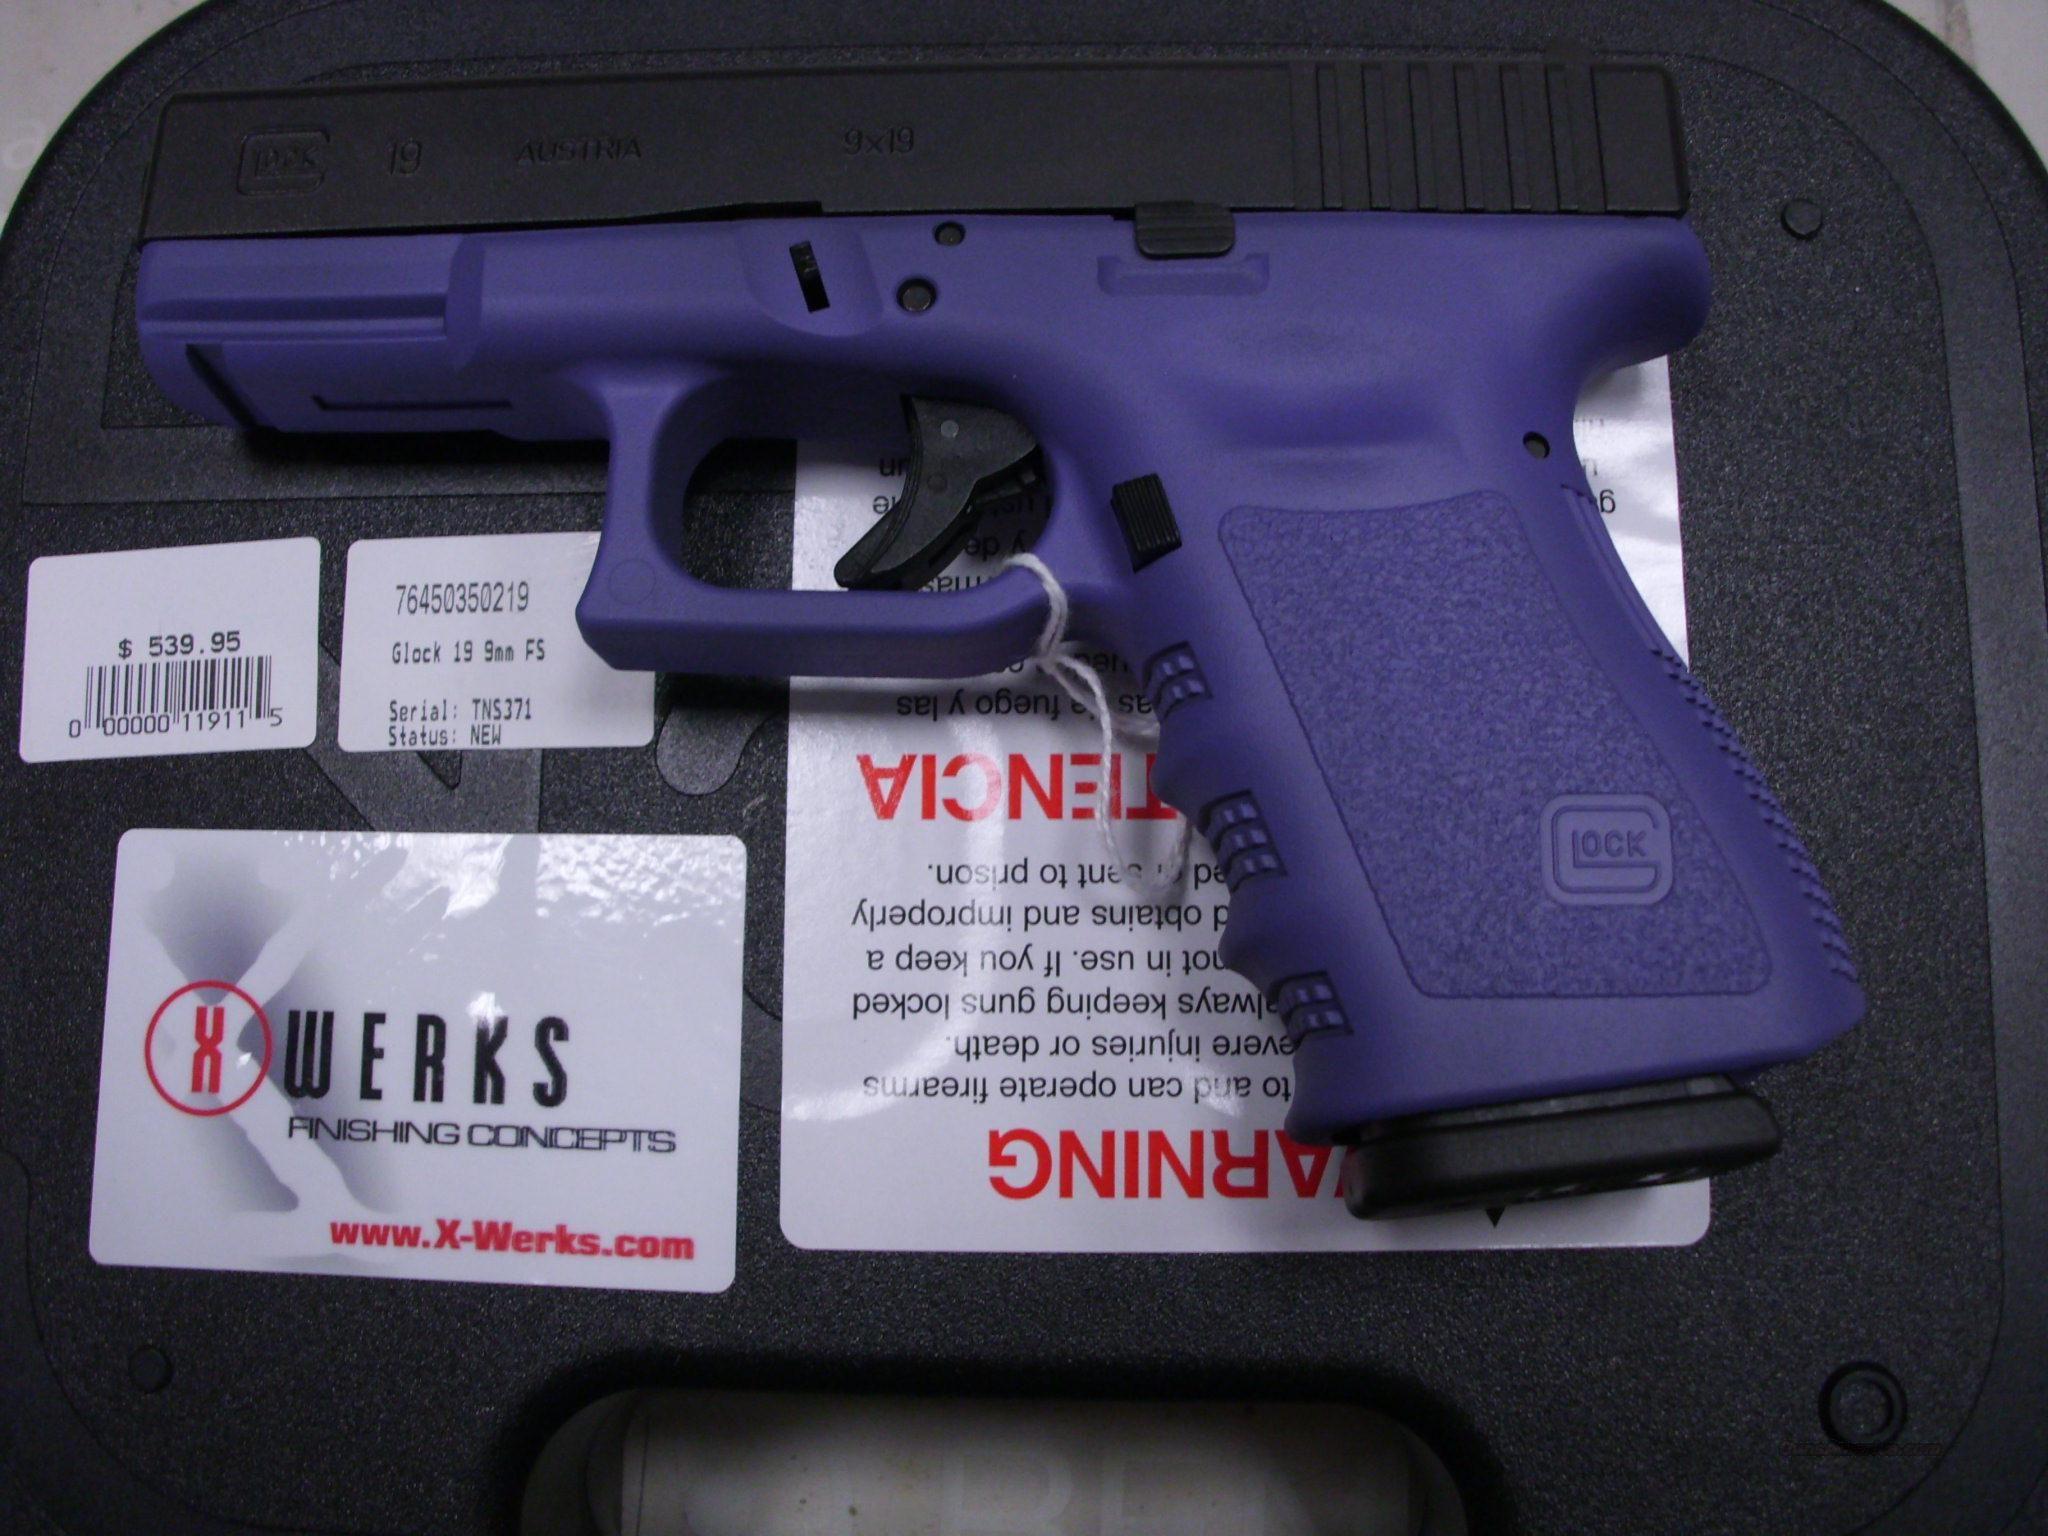 Glock 19 9mm And Its Purple 3 I Want It I Want It I Want It